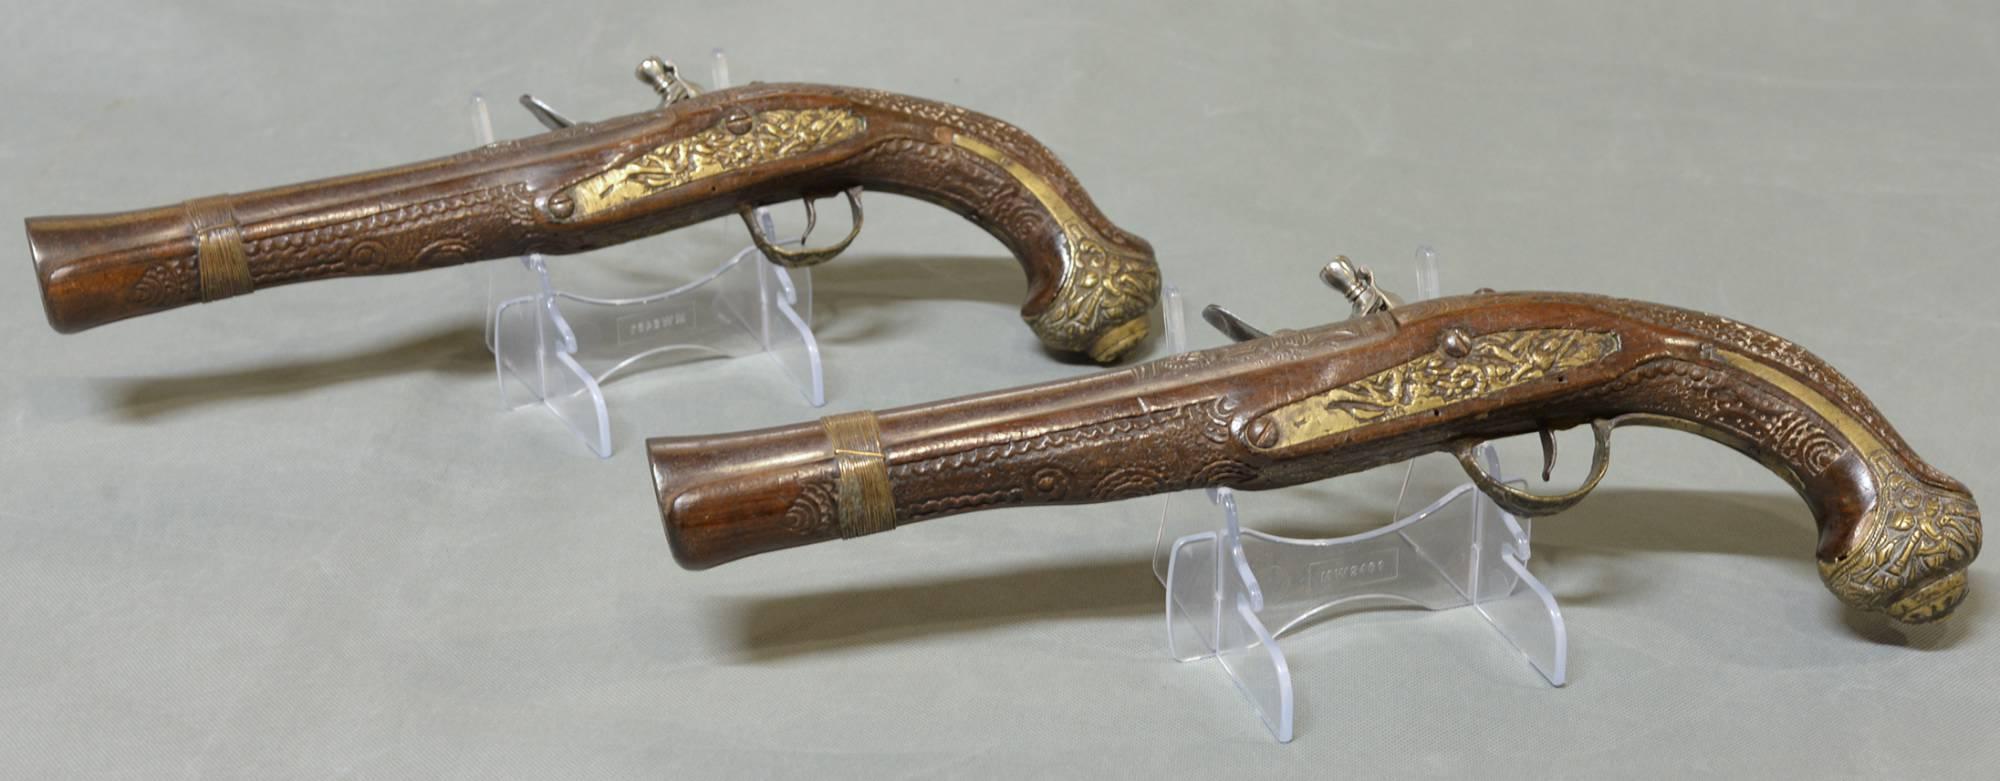 Antique Pistols - 16 For Sale on 1stdibs